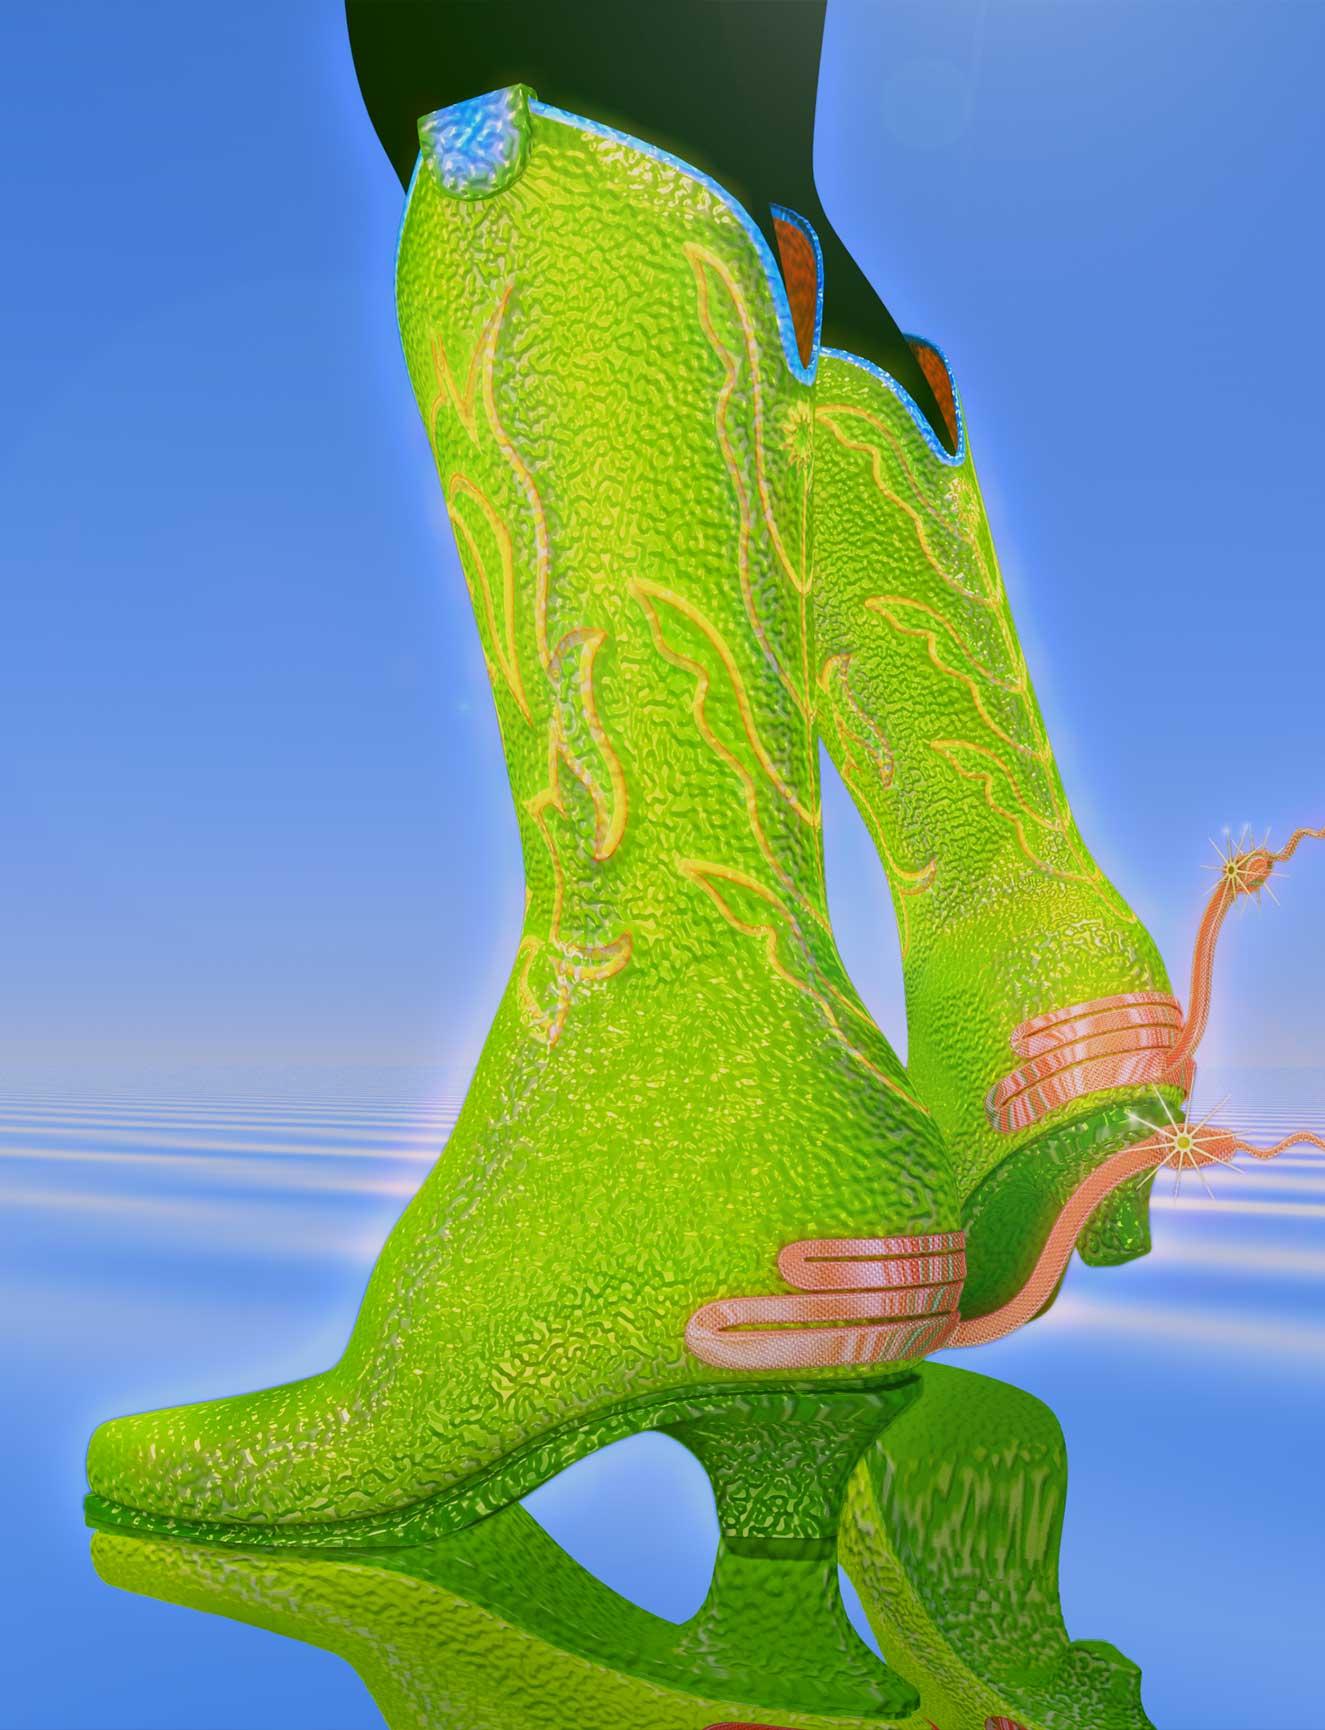 everpress-blog-hustle-crew-gabriel-gabriel-garble-cowboy-boots-with-rhinestones-lead-image